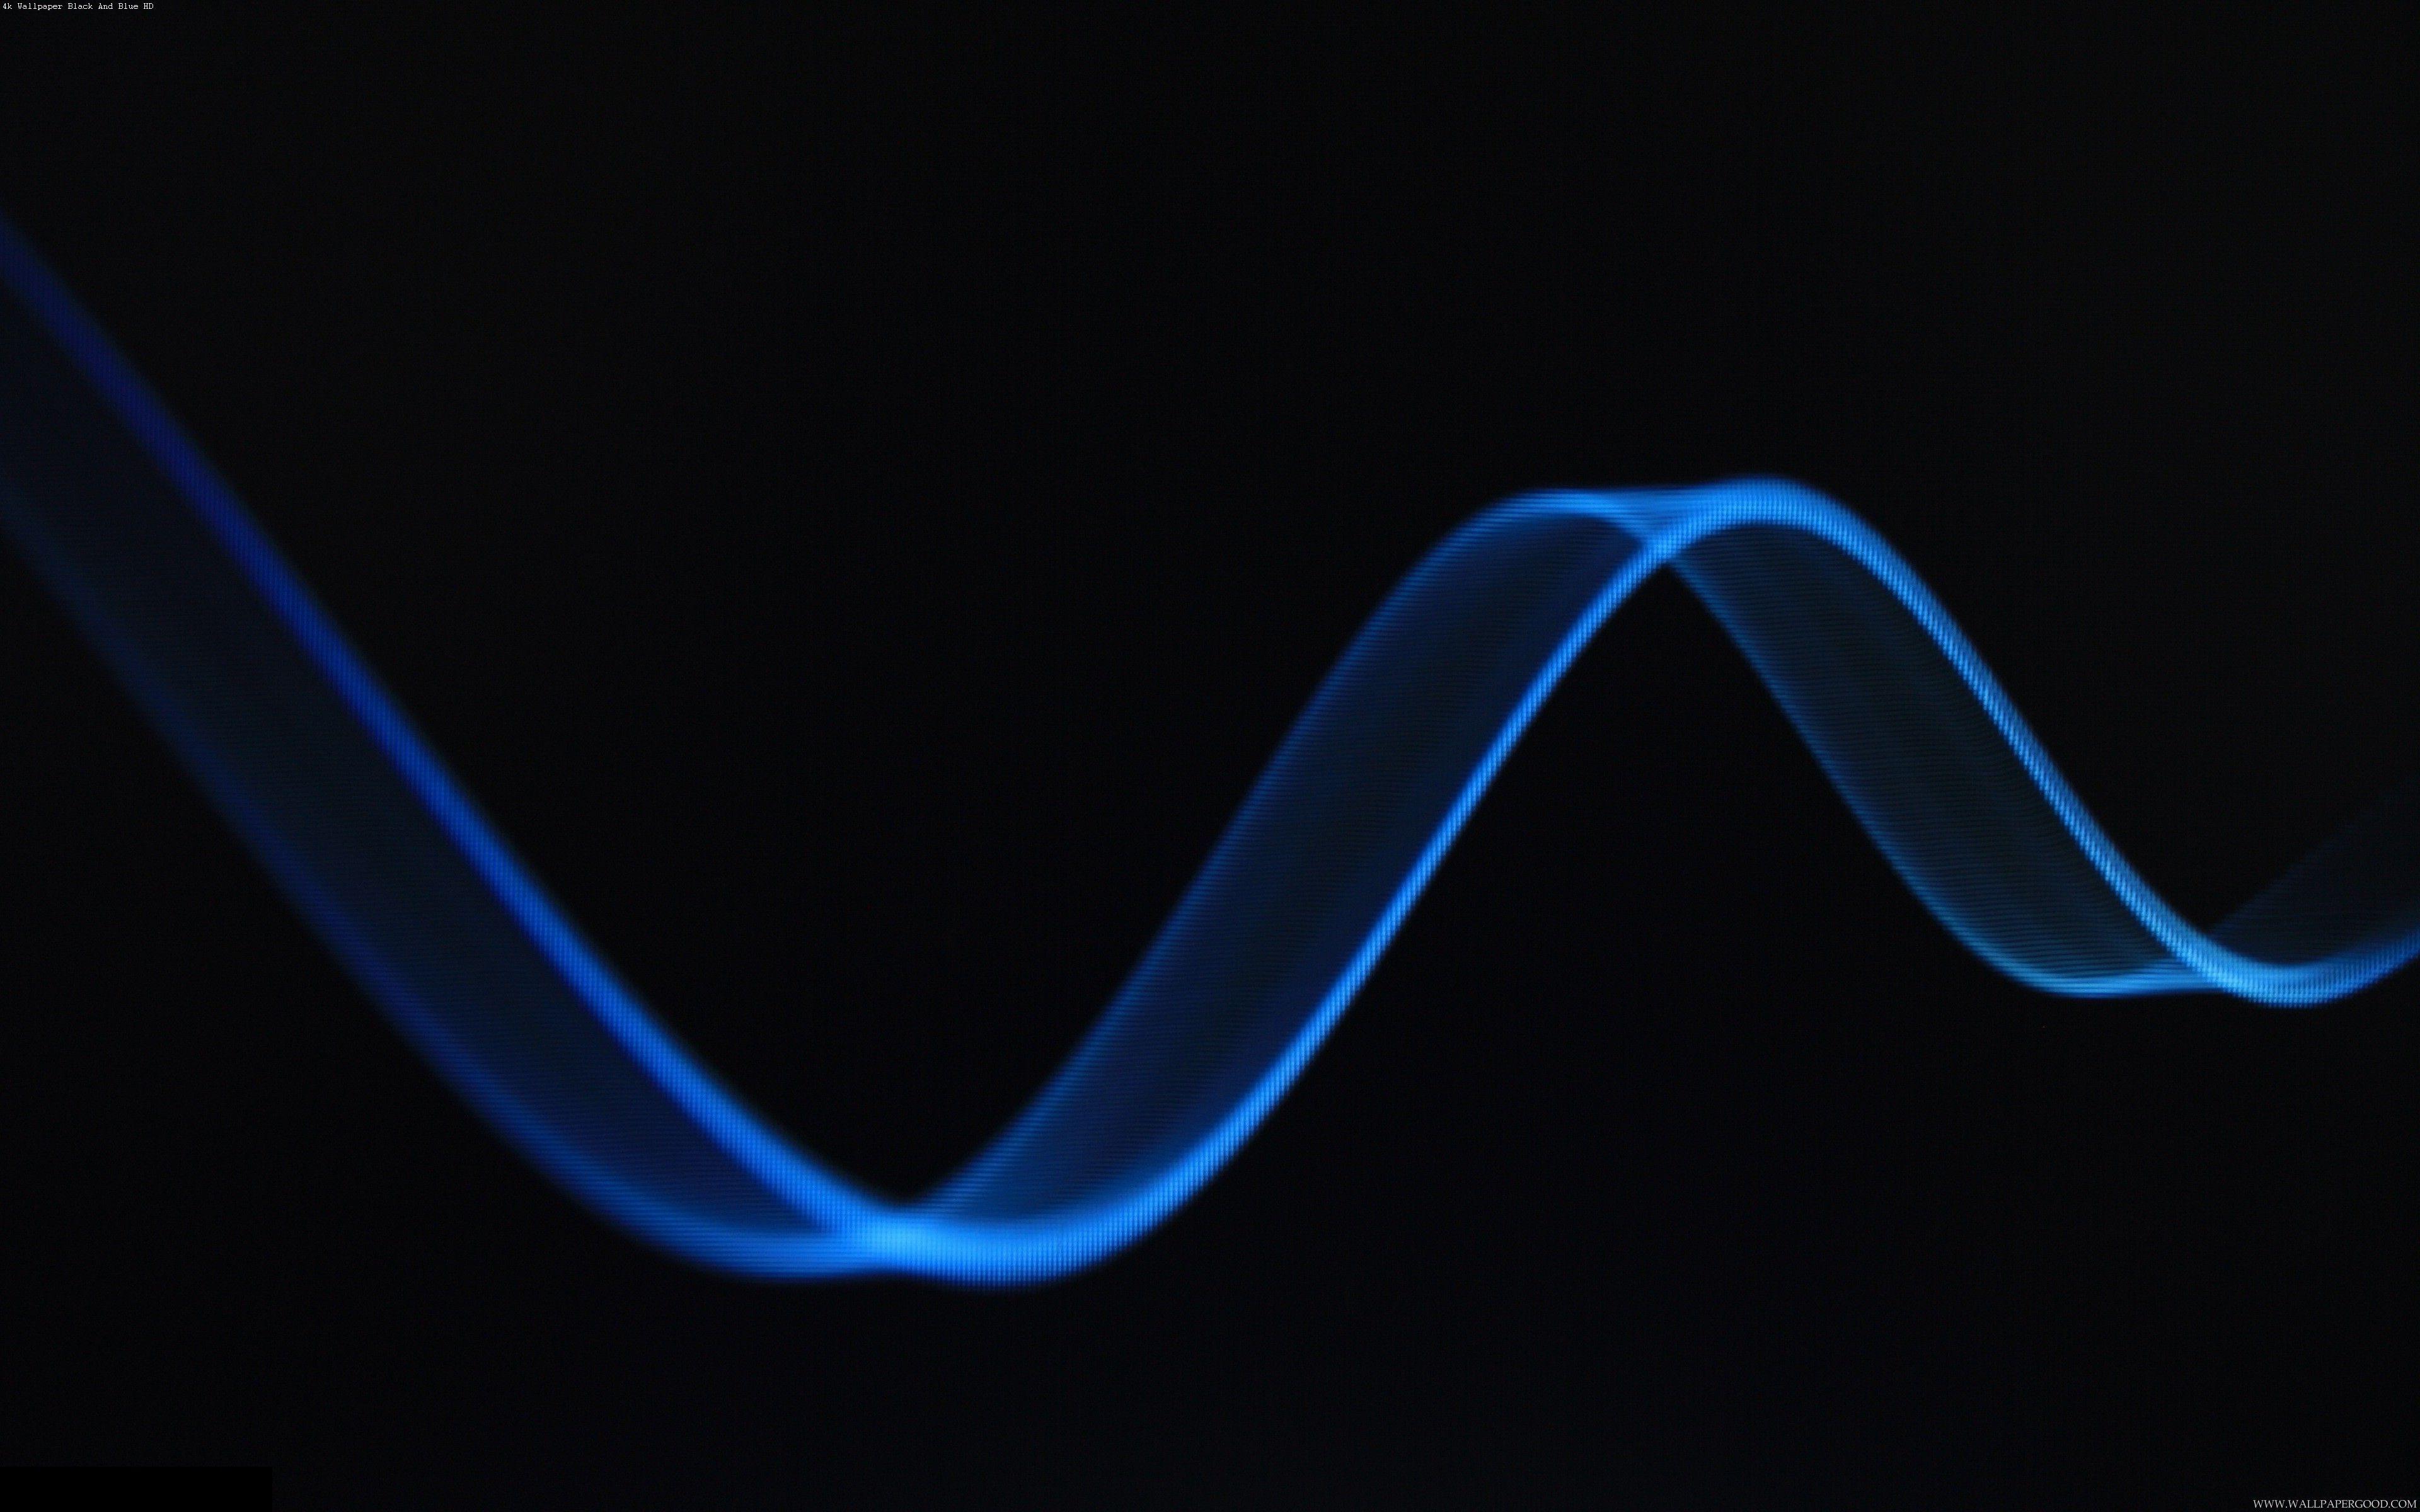 4k Wallpaper Black And Blue Hd Black And Blue Wallpaper Neon Backgrounds Light In The Dark 4k wallpaper dark blue